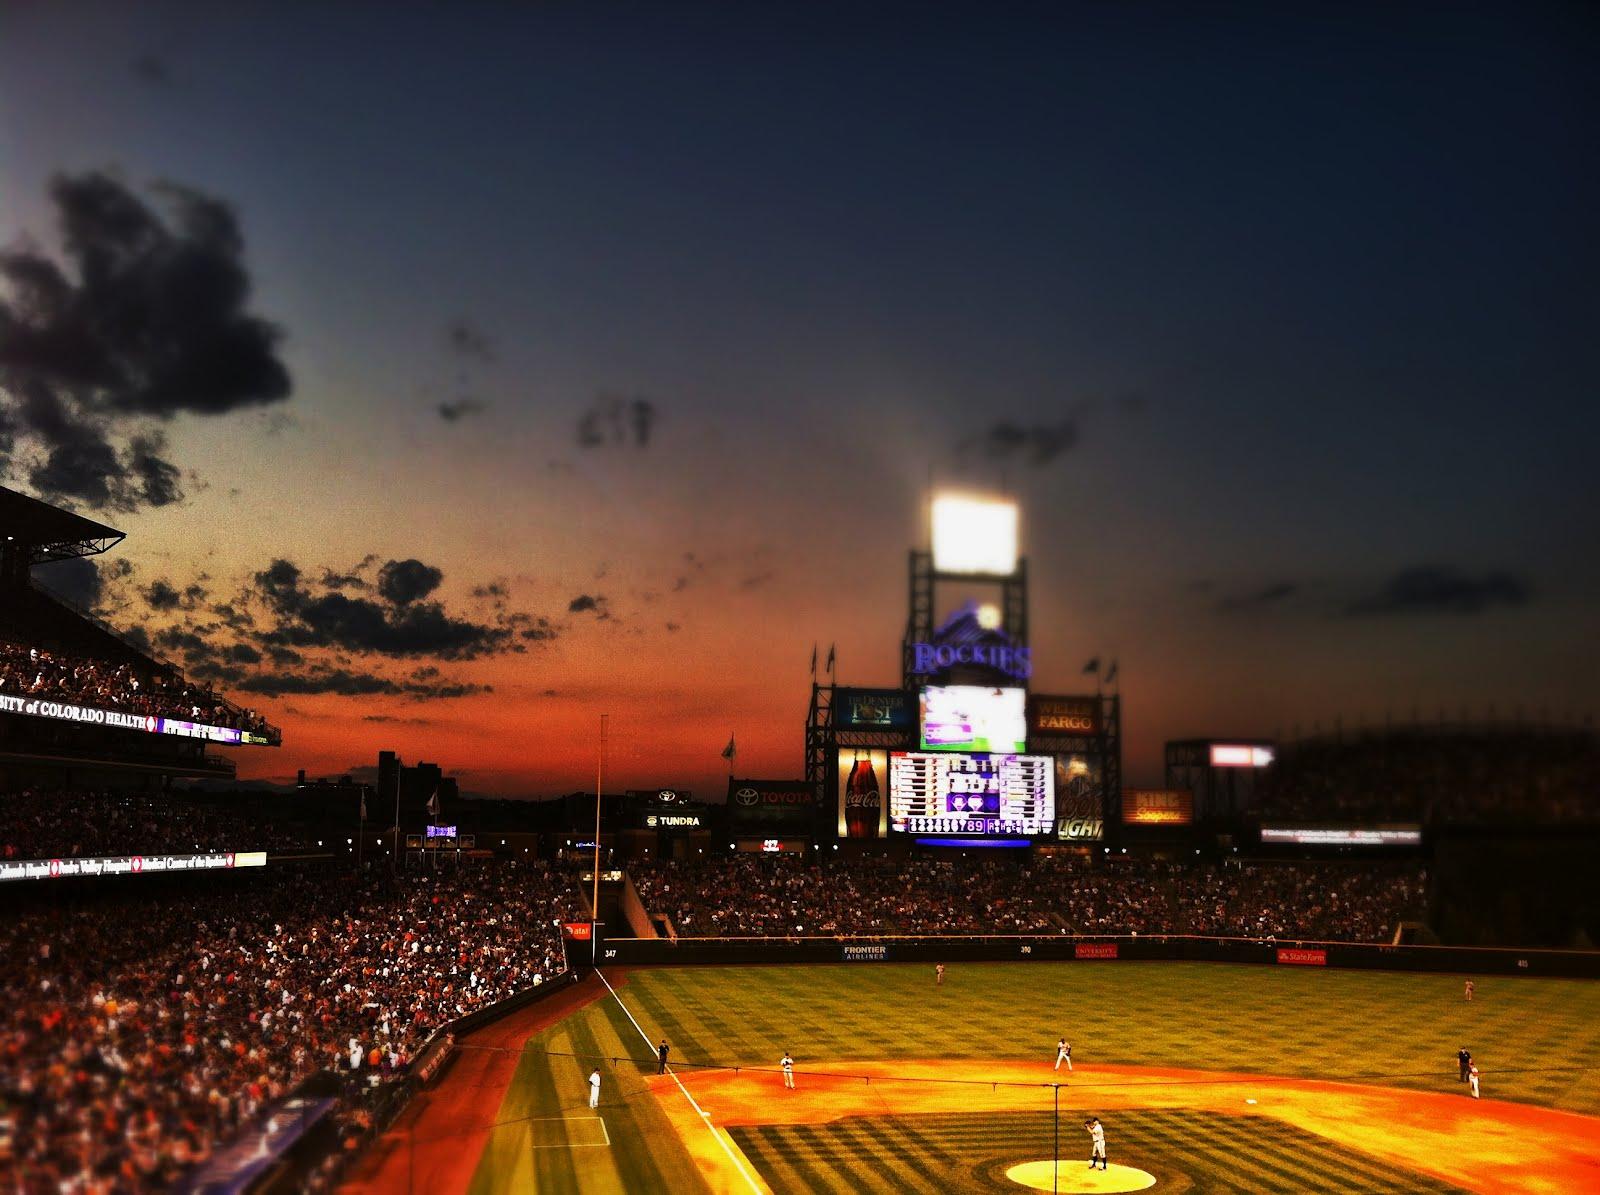 Baseball Field At Night